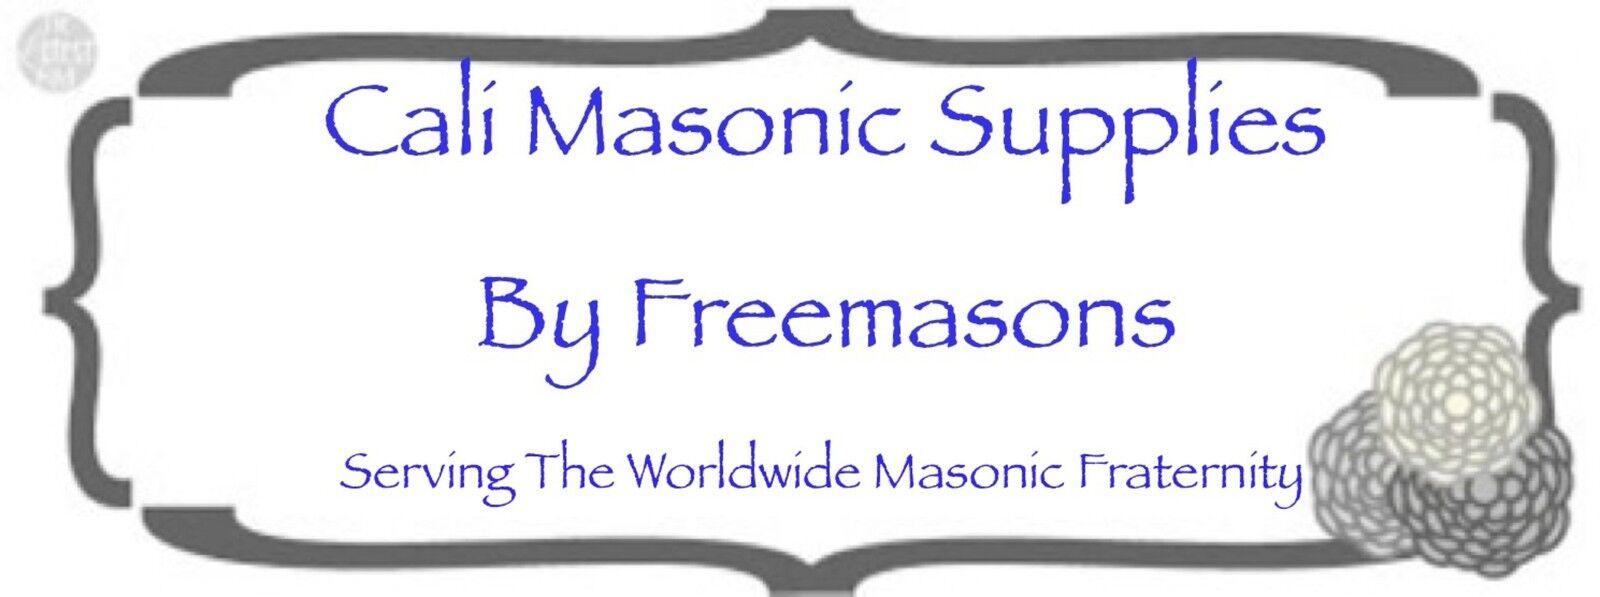 Cal Masonic Supplies By Freemasons